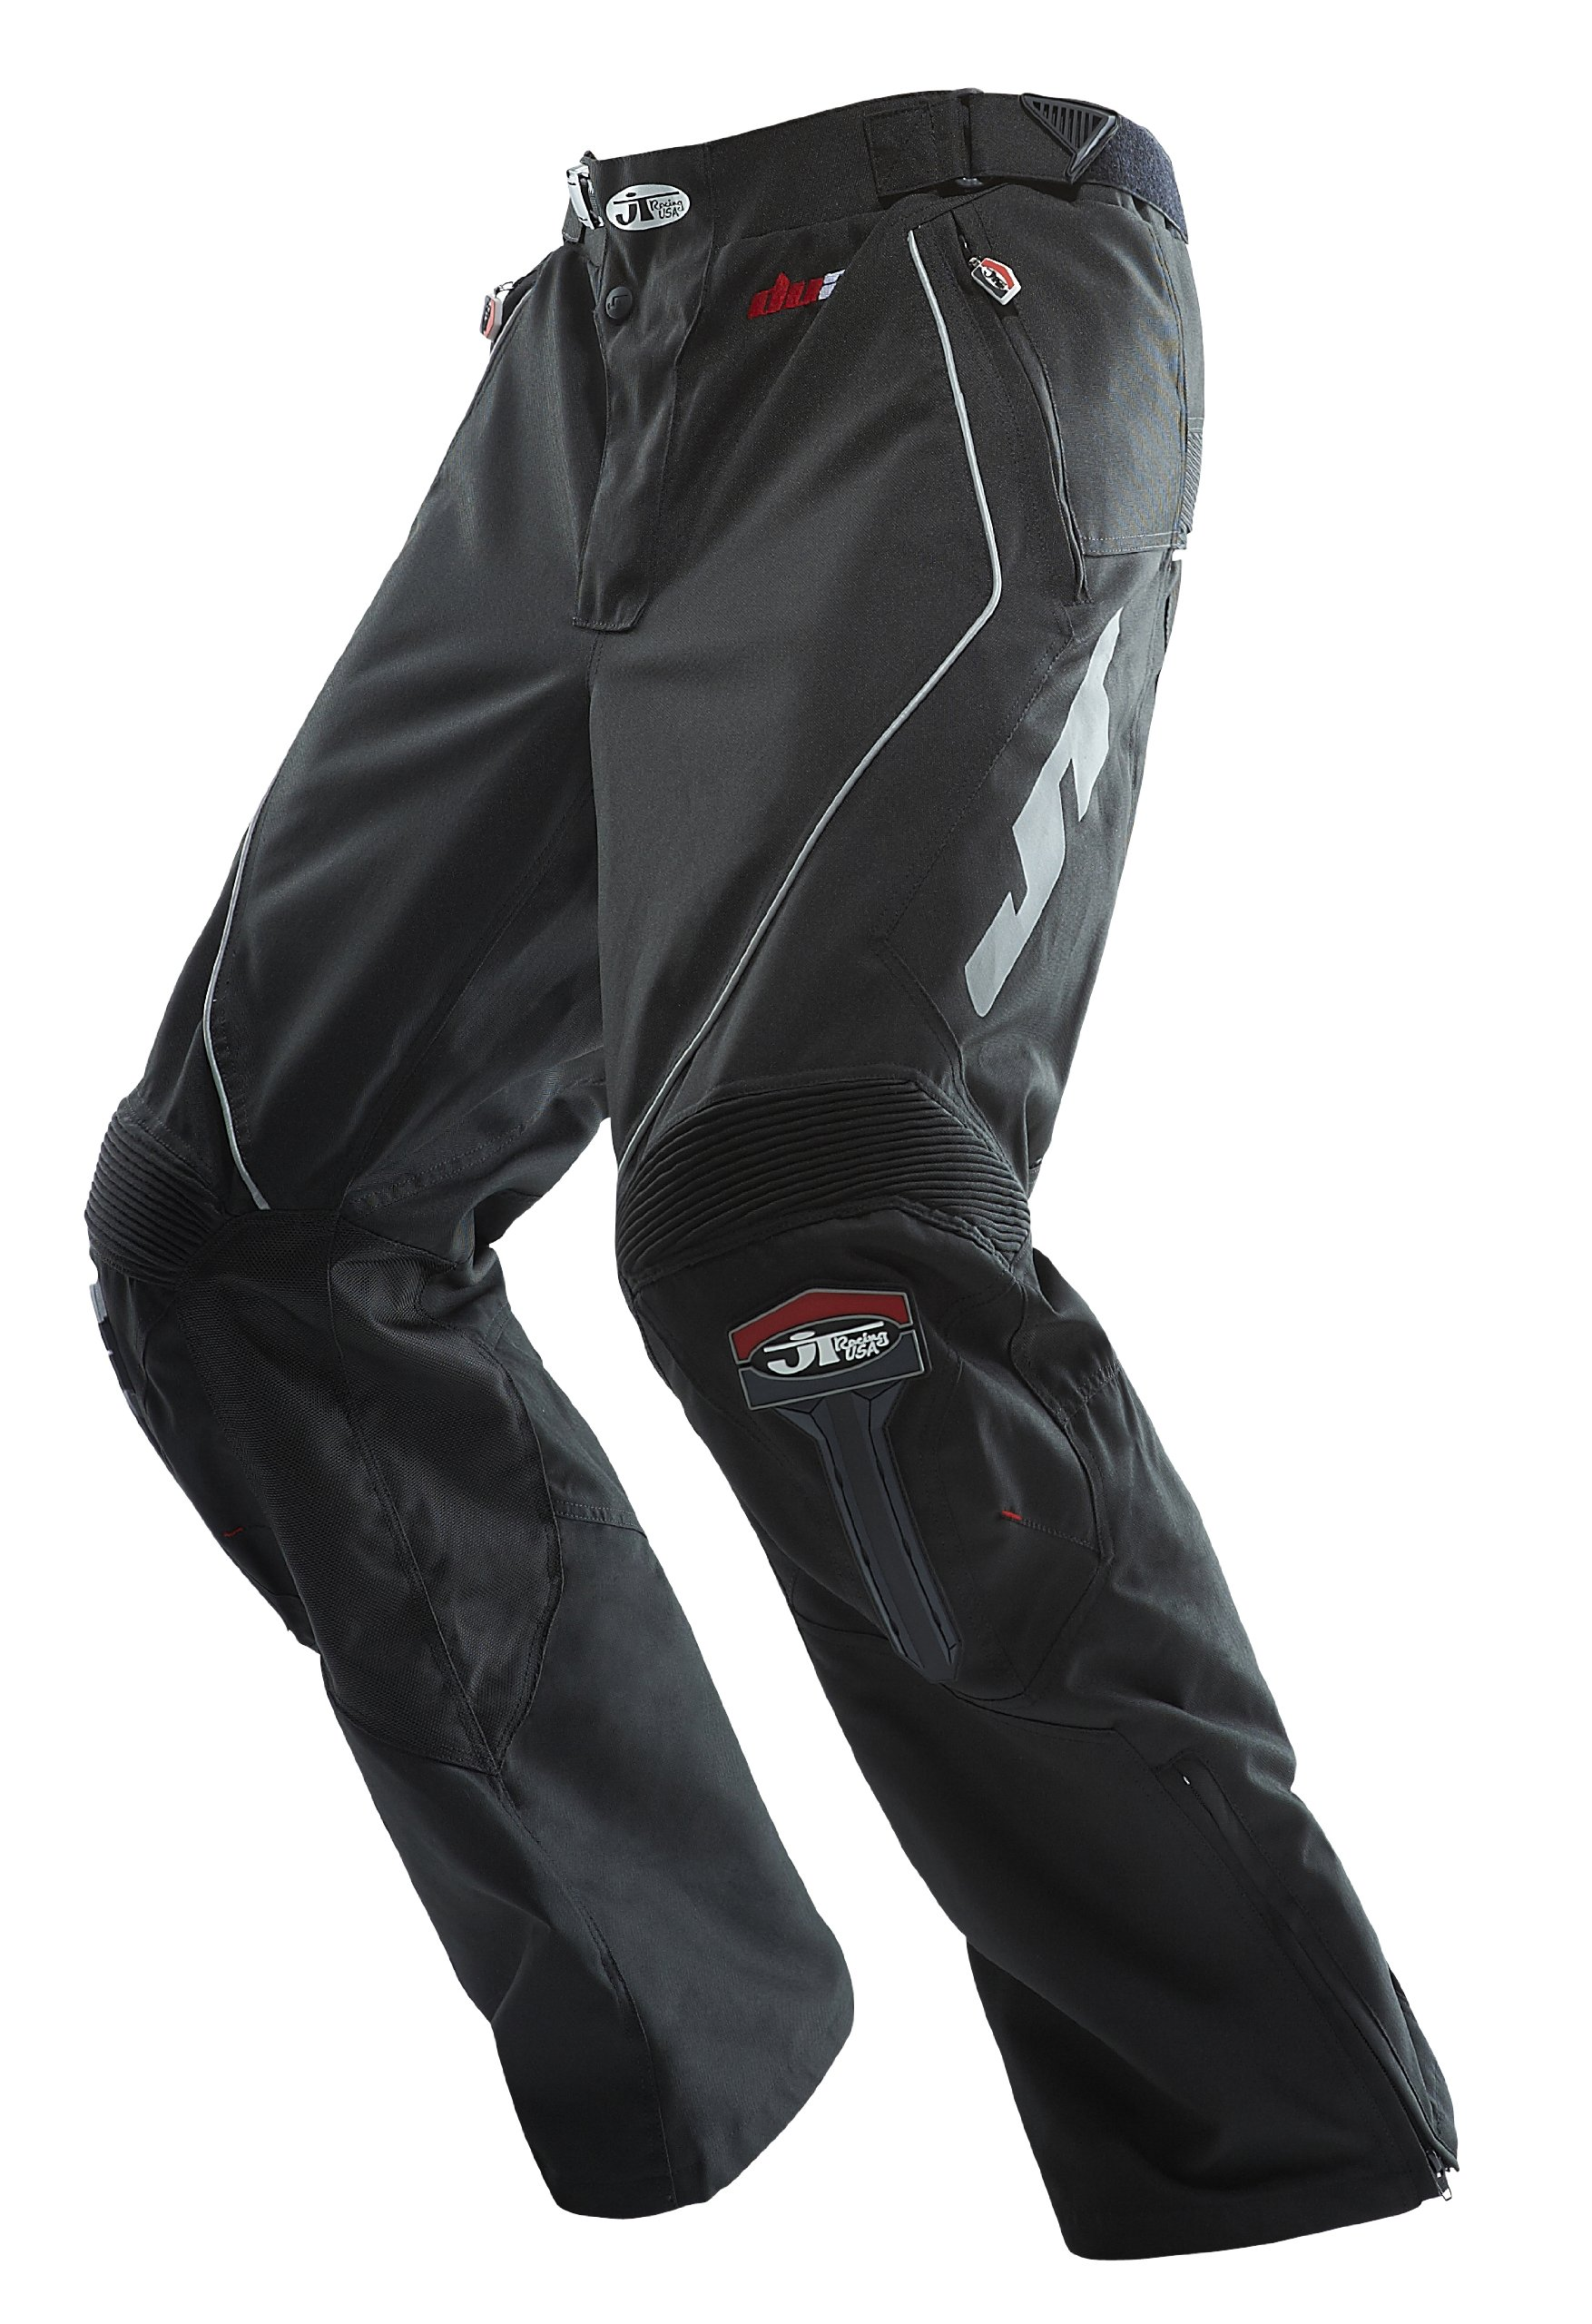 JT Racing USA Dirt Bike Enduro Pants (Black, Size 28)